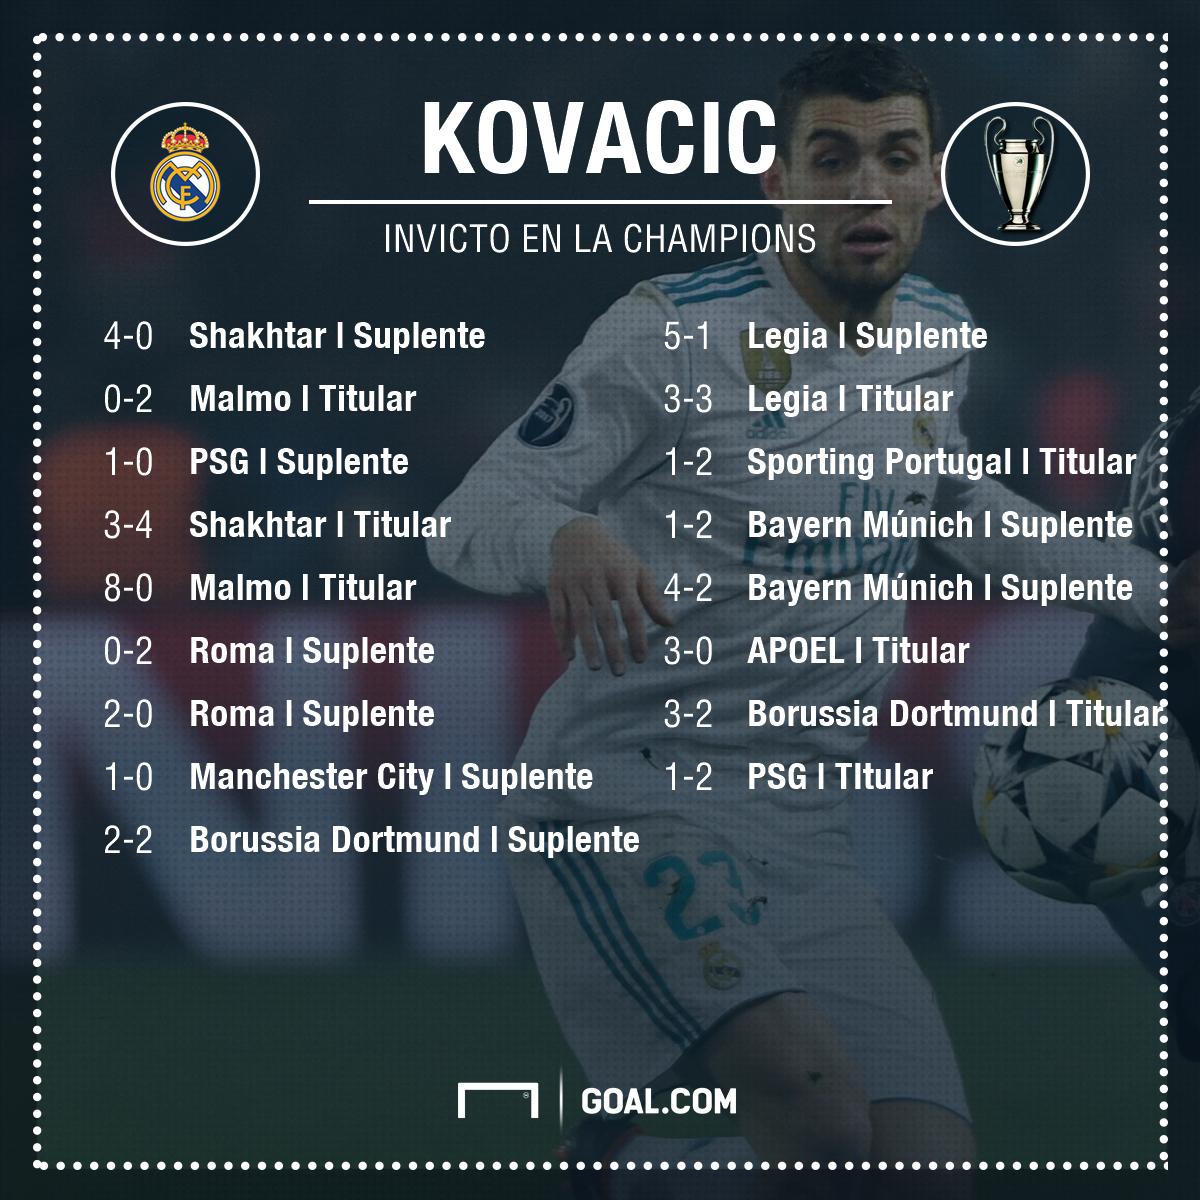 Kovacic en la Champions